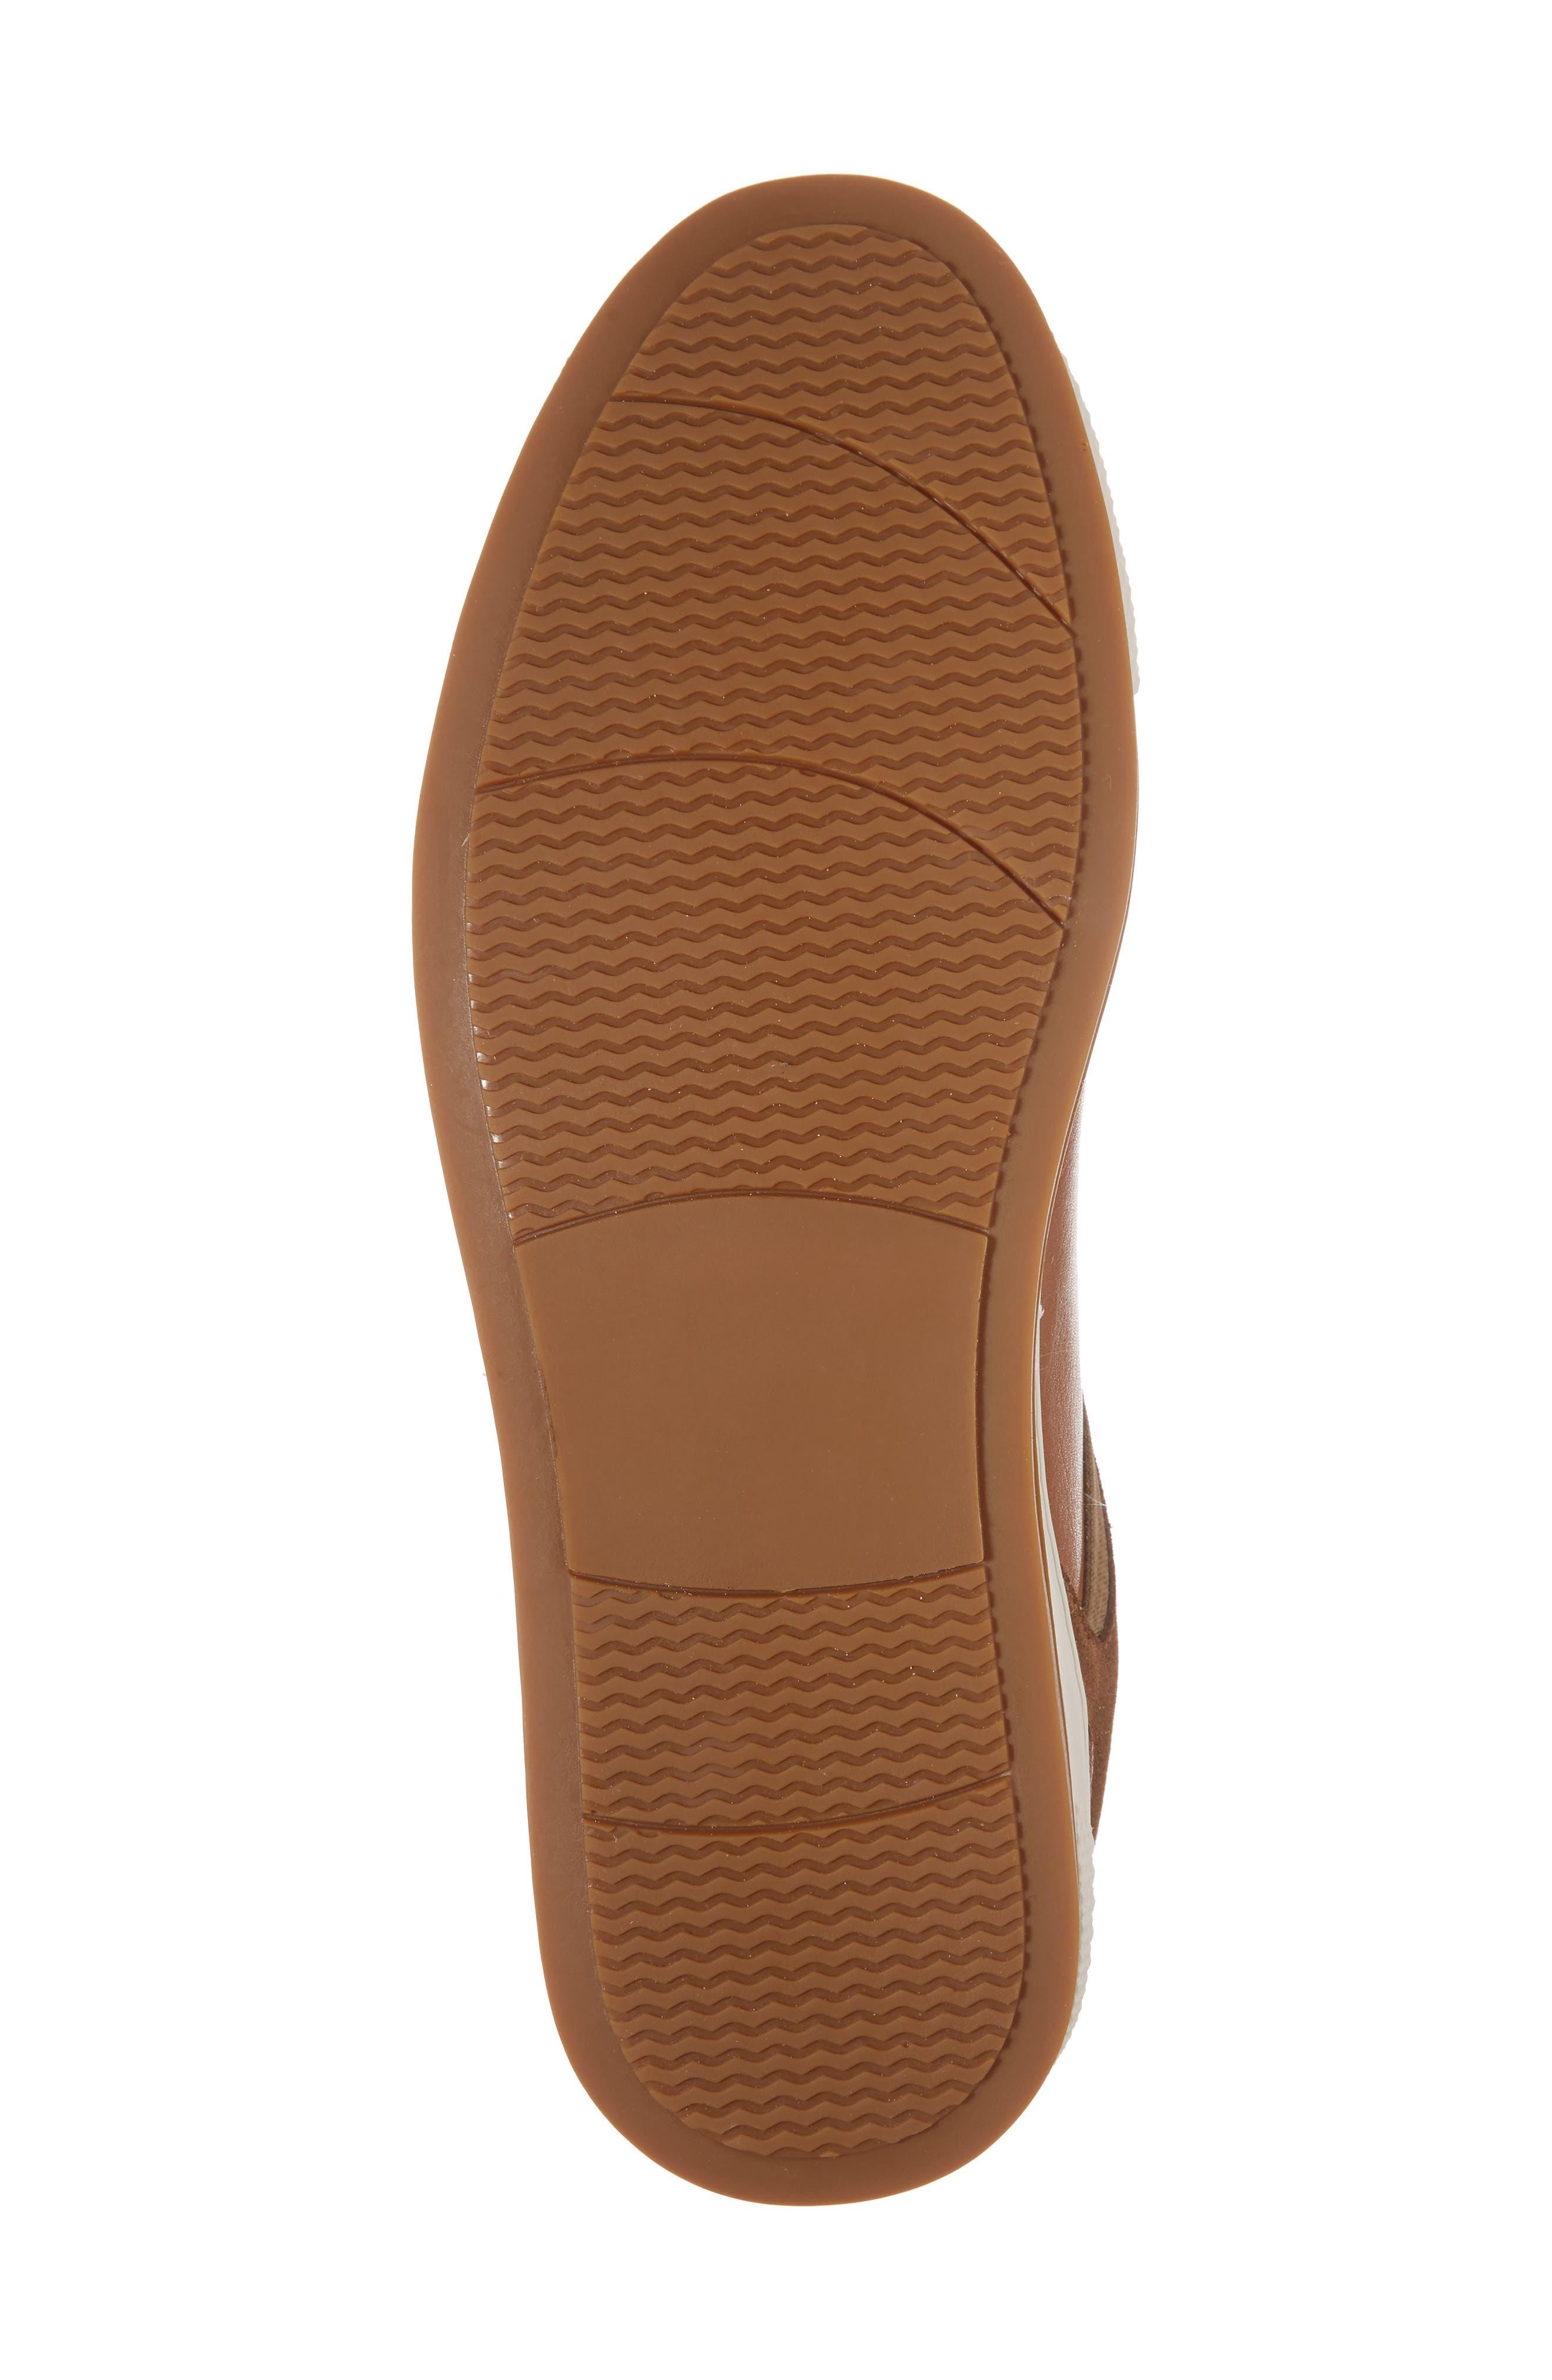 Ireton Low Top Sneaker,                             Alternate thumbnail 6, color,                             Cognac Leather/ Suede